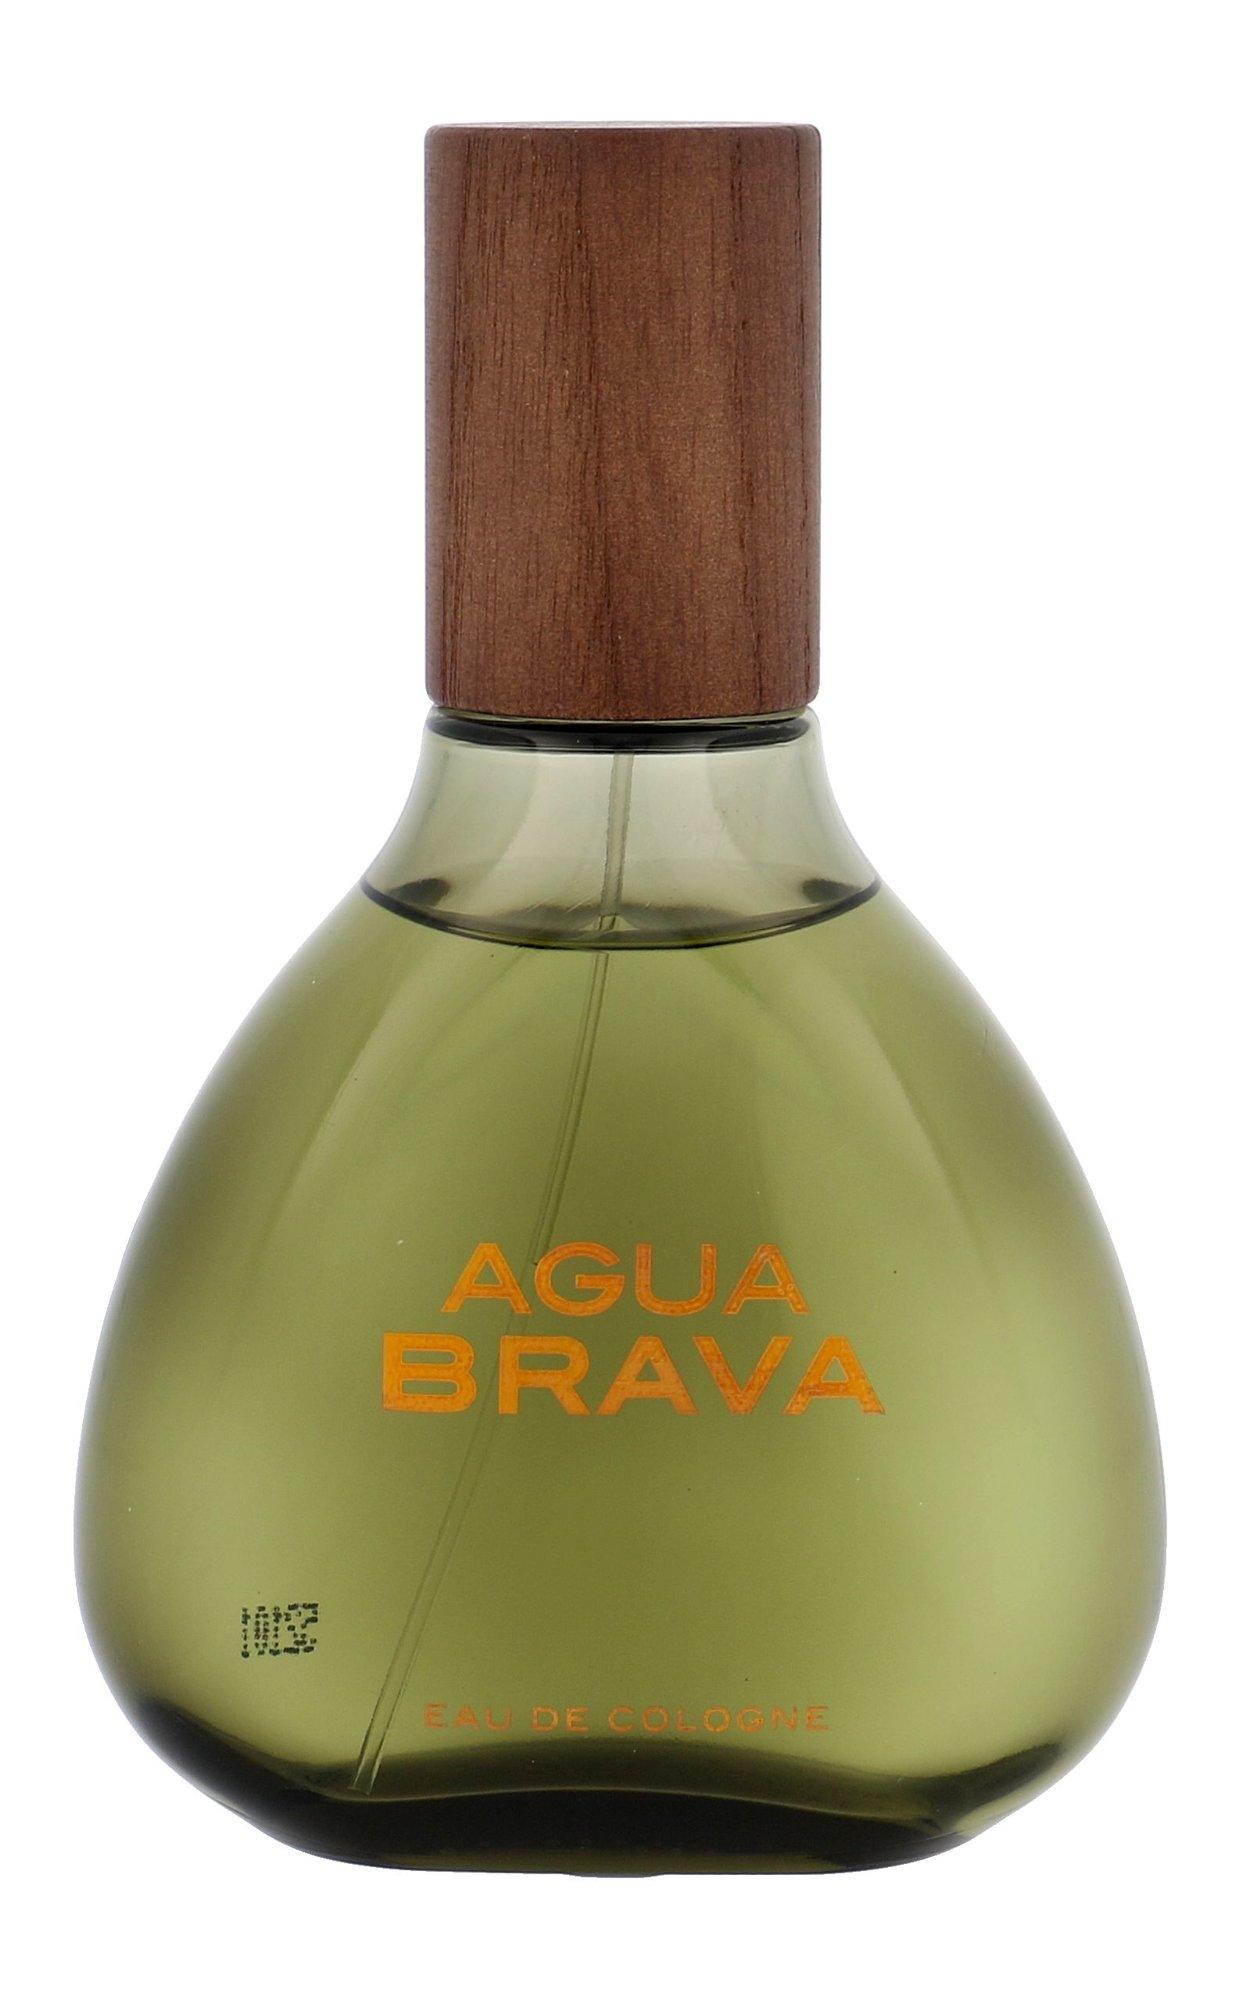 Antonio Puig Agua Brava Cologne 100ml